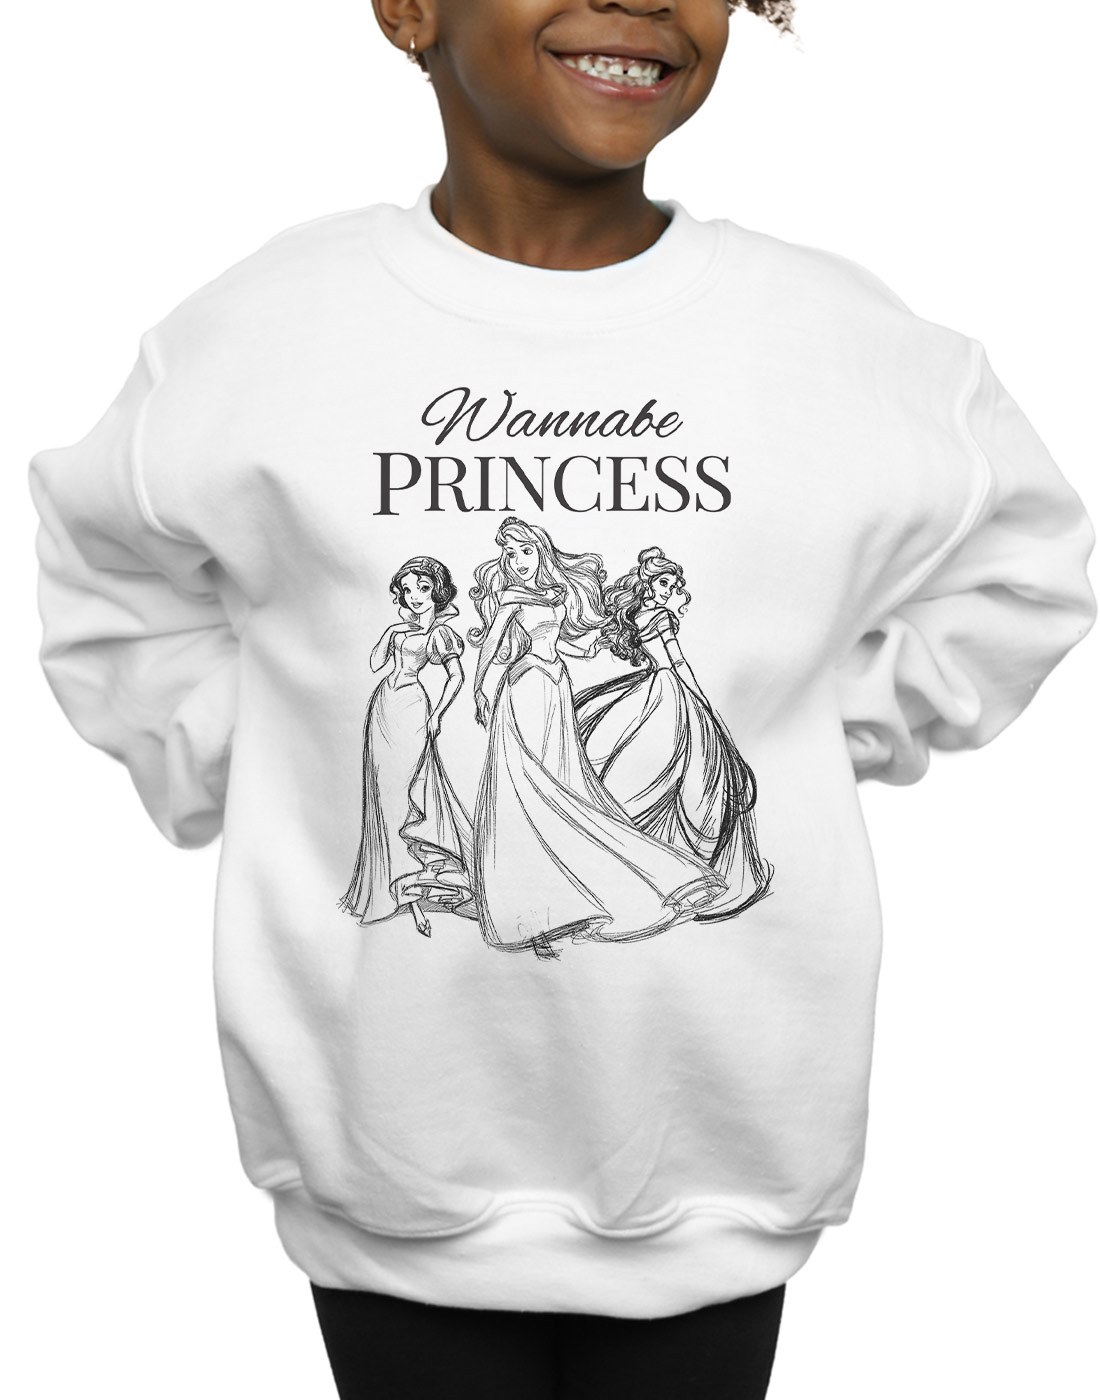 Sweatshirt Sizes 7-12 years Girls Disney Princess Kids